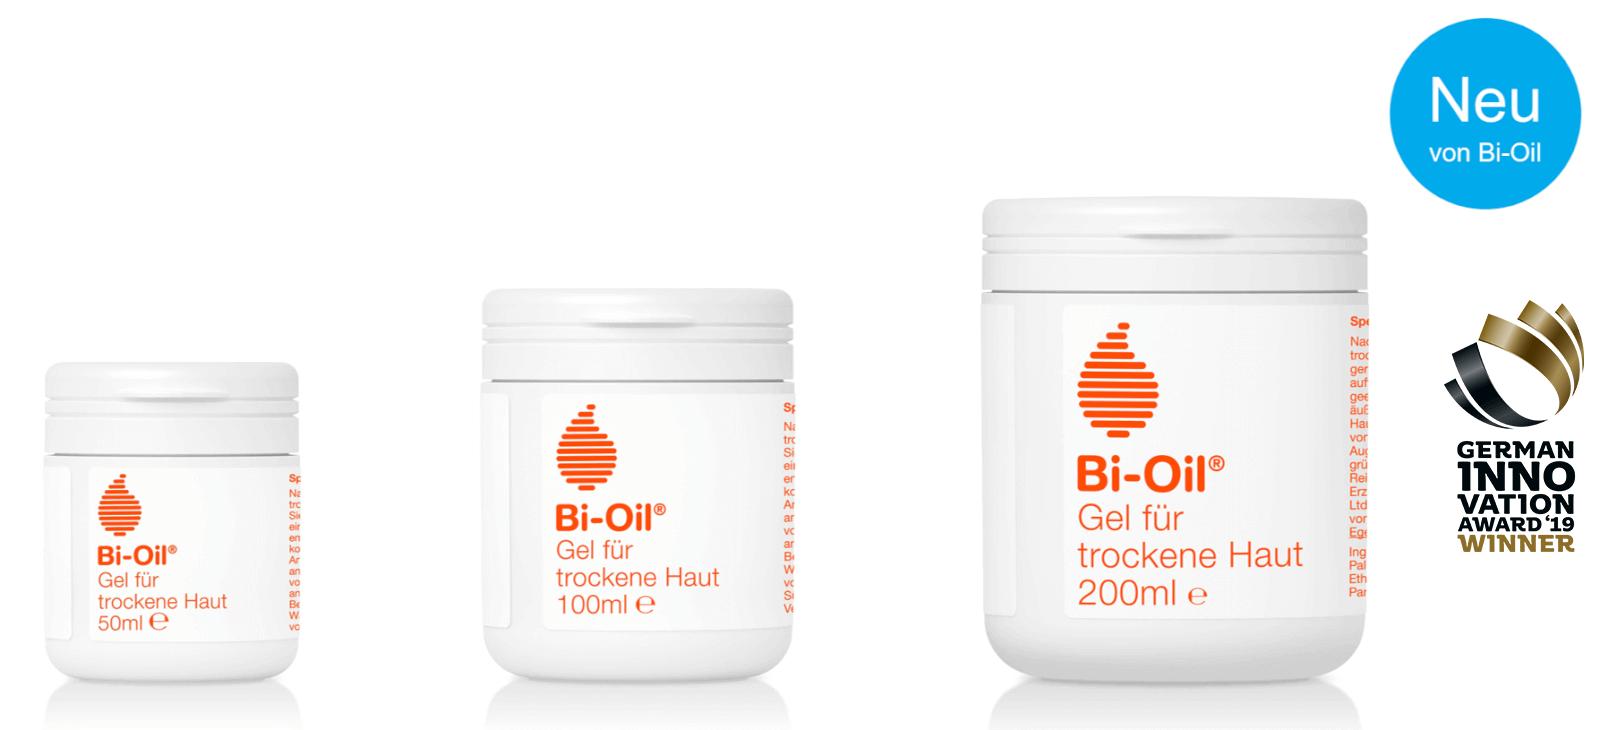 Bi Oil Gel für trockene Haut Produkte